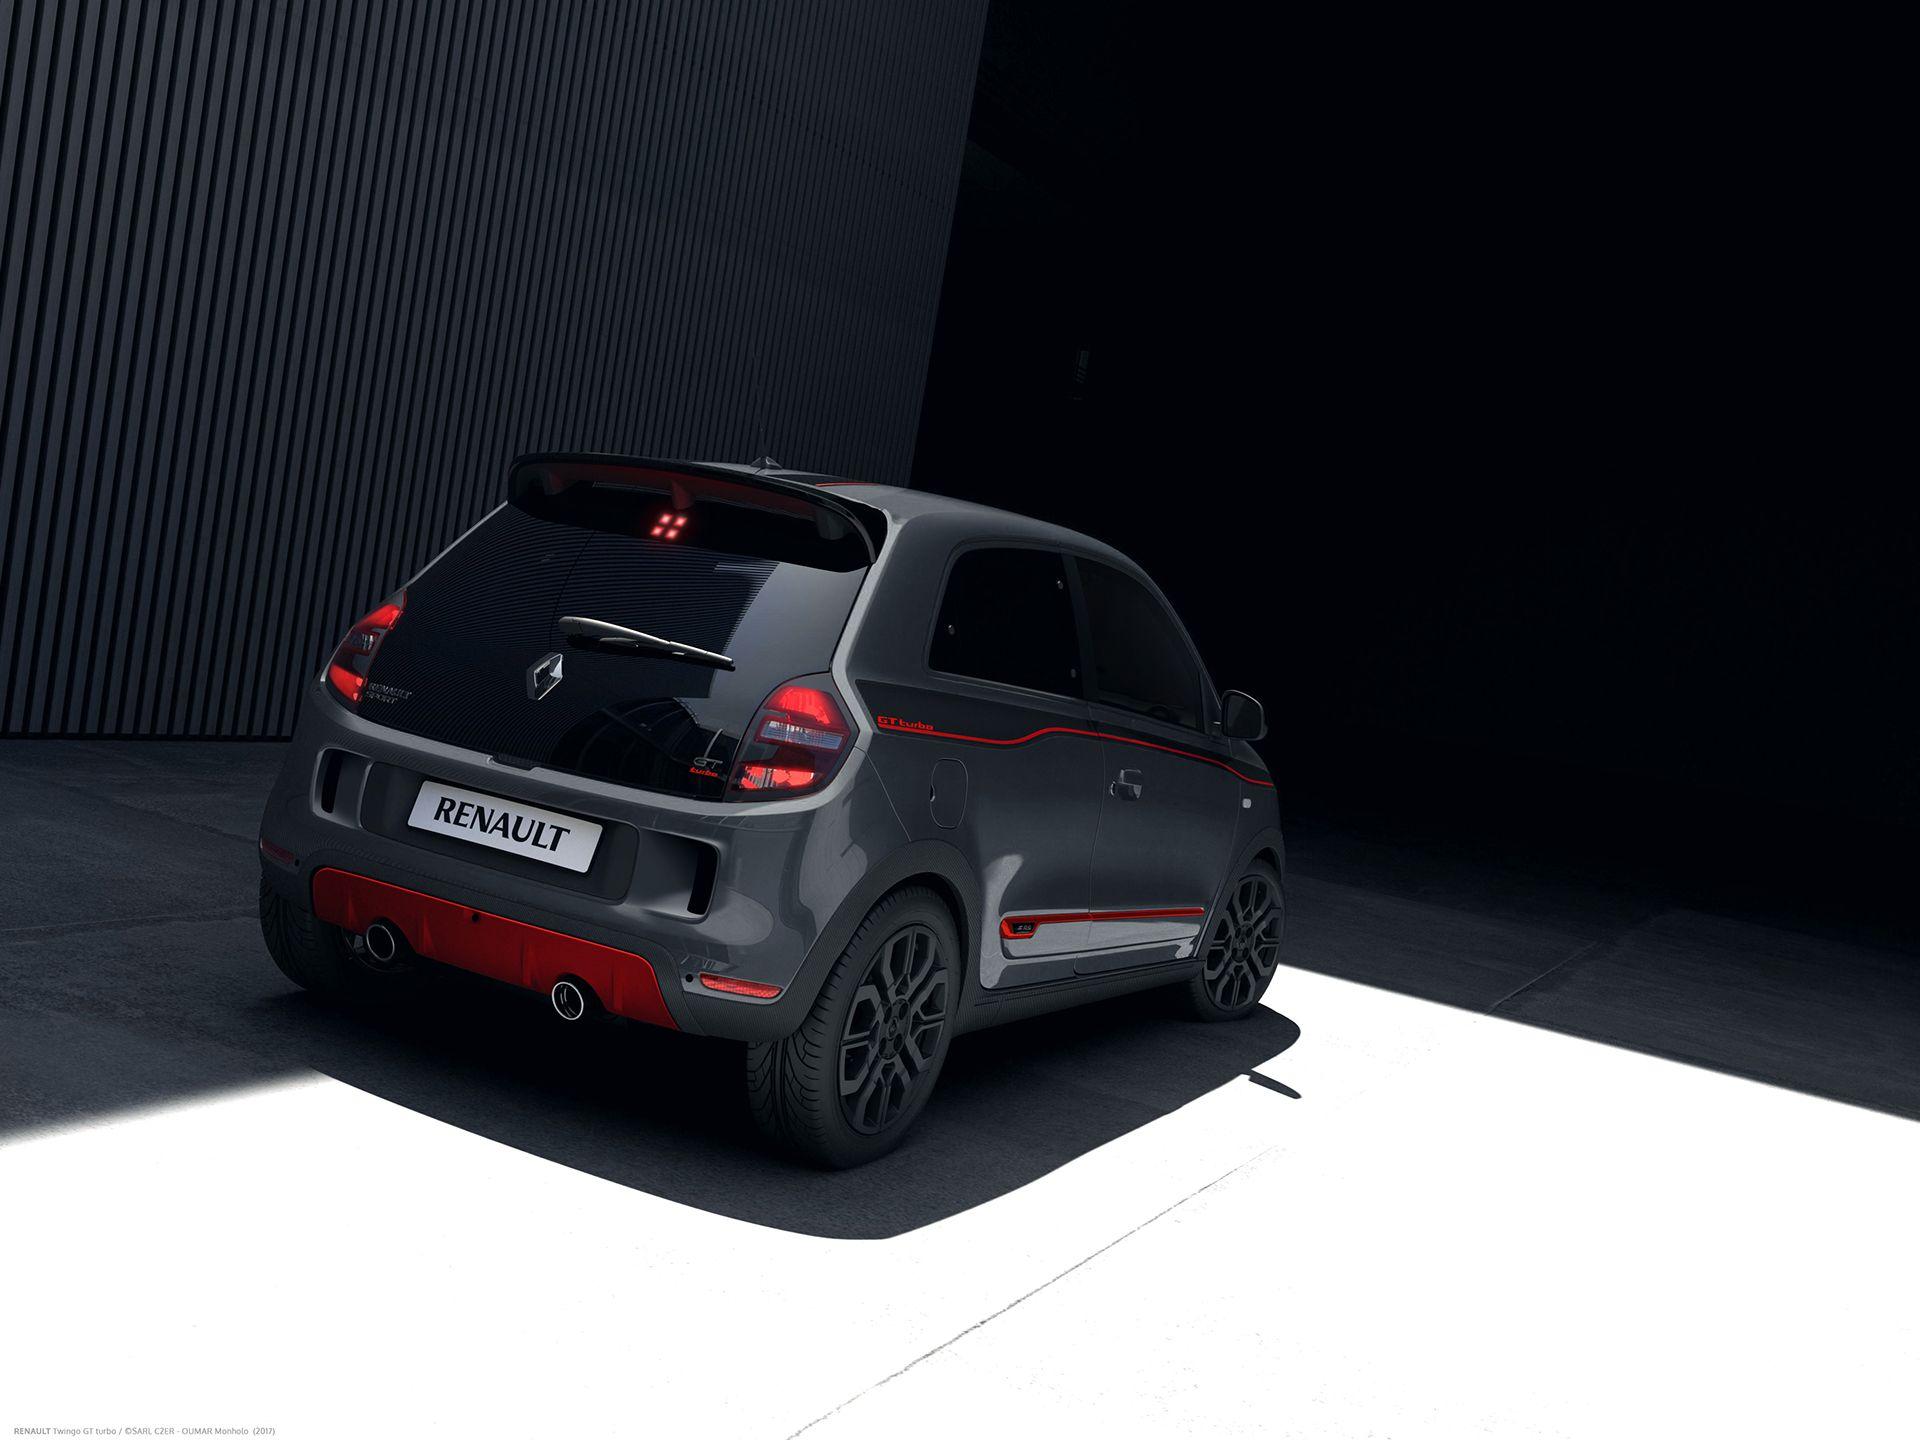 Renault Twingo Gt Turbo On Behance ルノー トゥインゴ トゥインゴ